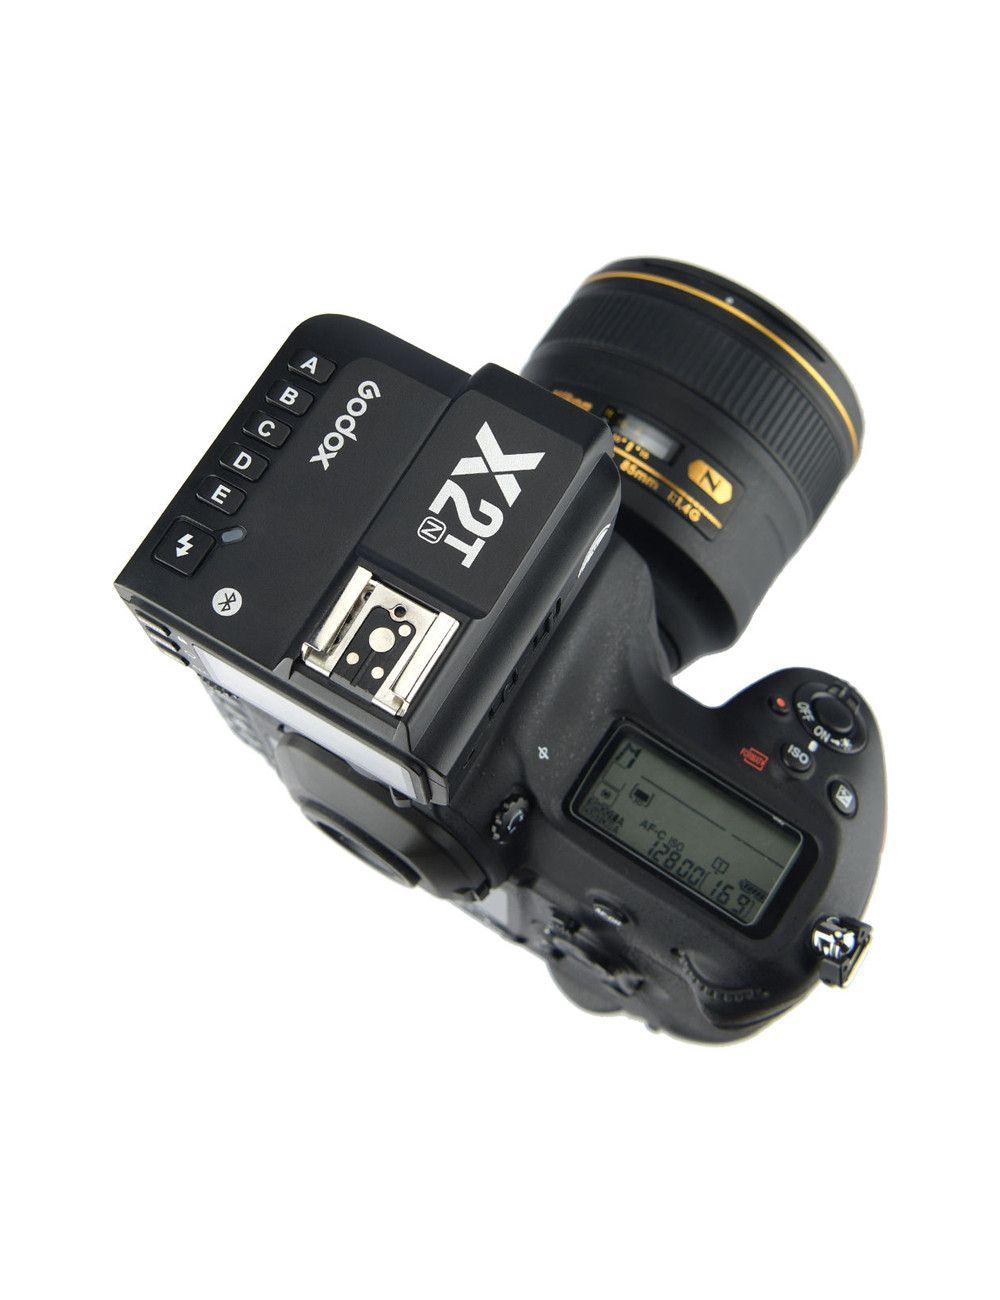 Kit accesorios para Speedlight (no incluye flash) www.apertura.cl